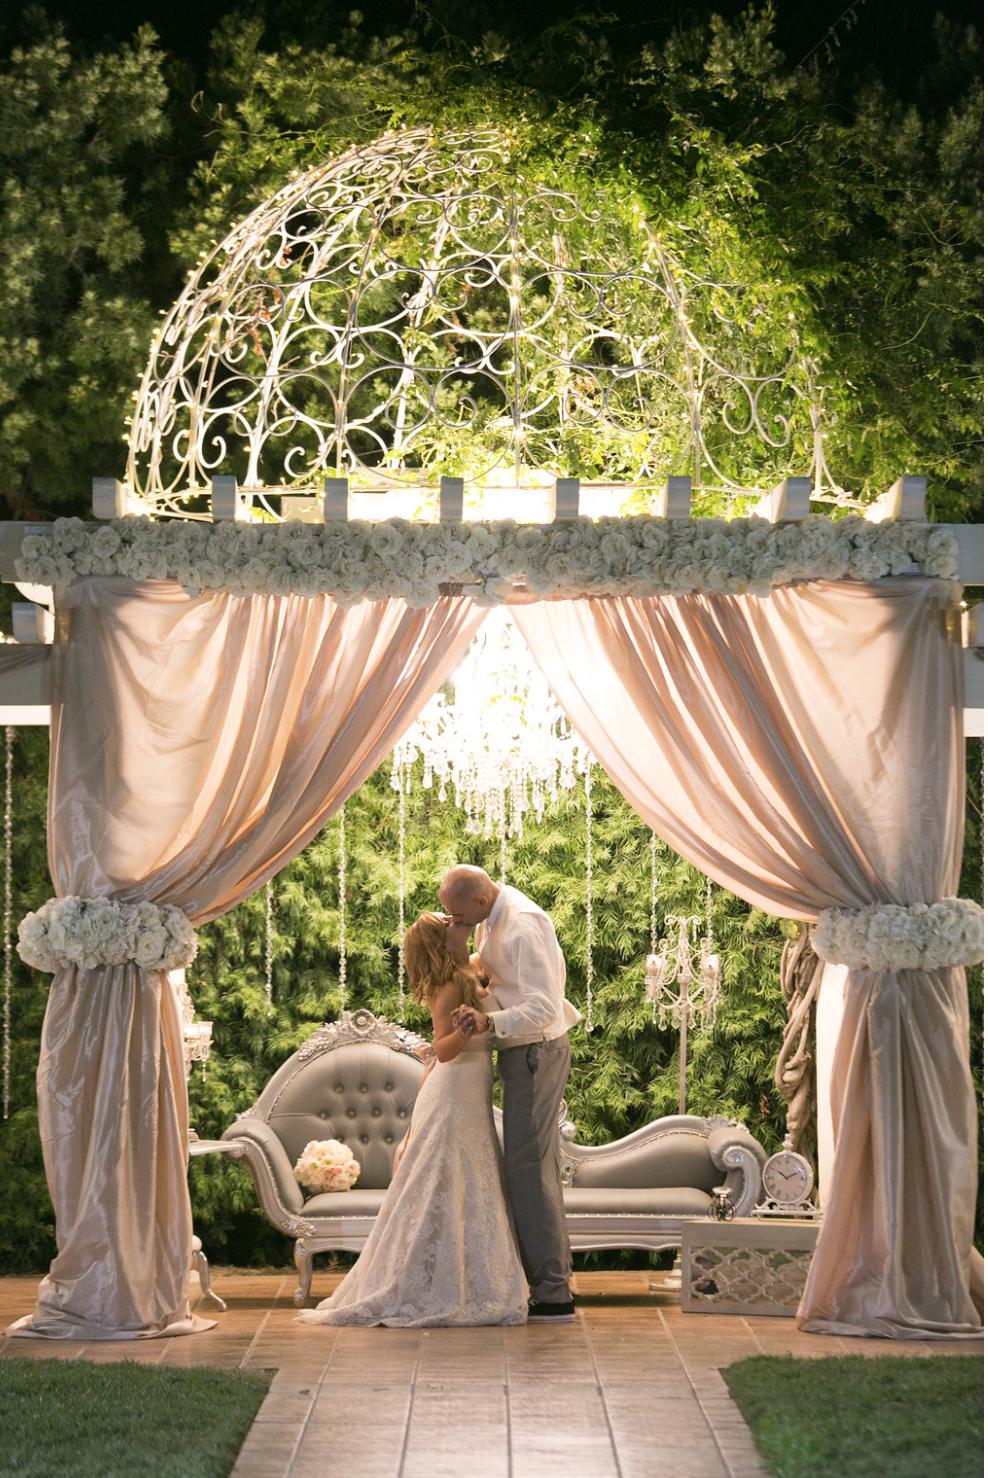 Pin By Villa De Amore California Wedd On Temecula Weddings Temecula Weddings Vineyard Wedding Venue Temecula Wedding Venues